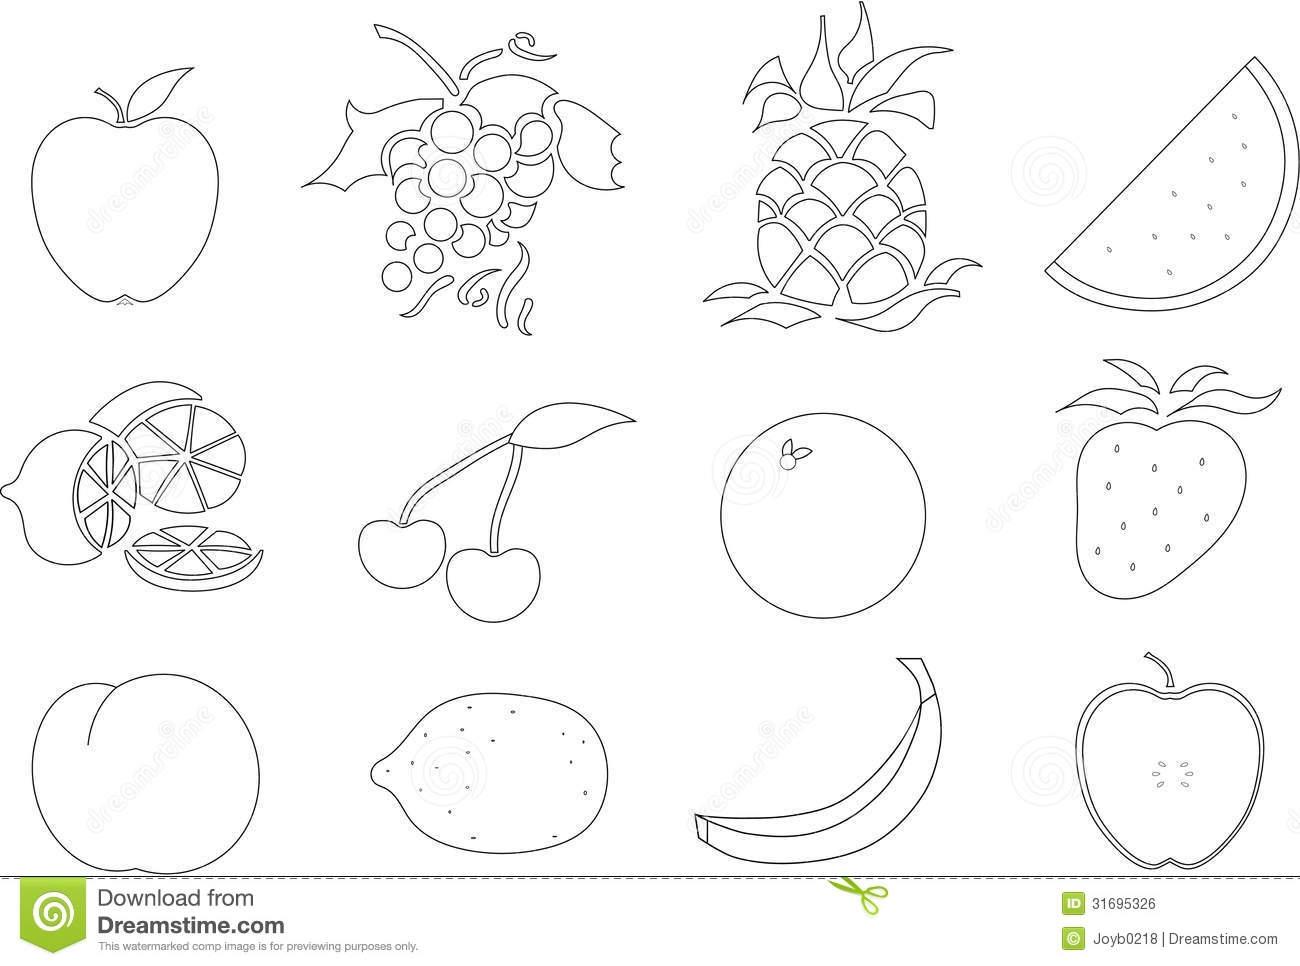 Fruit Salad Coloring Page At Getdrawings